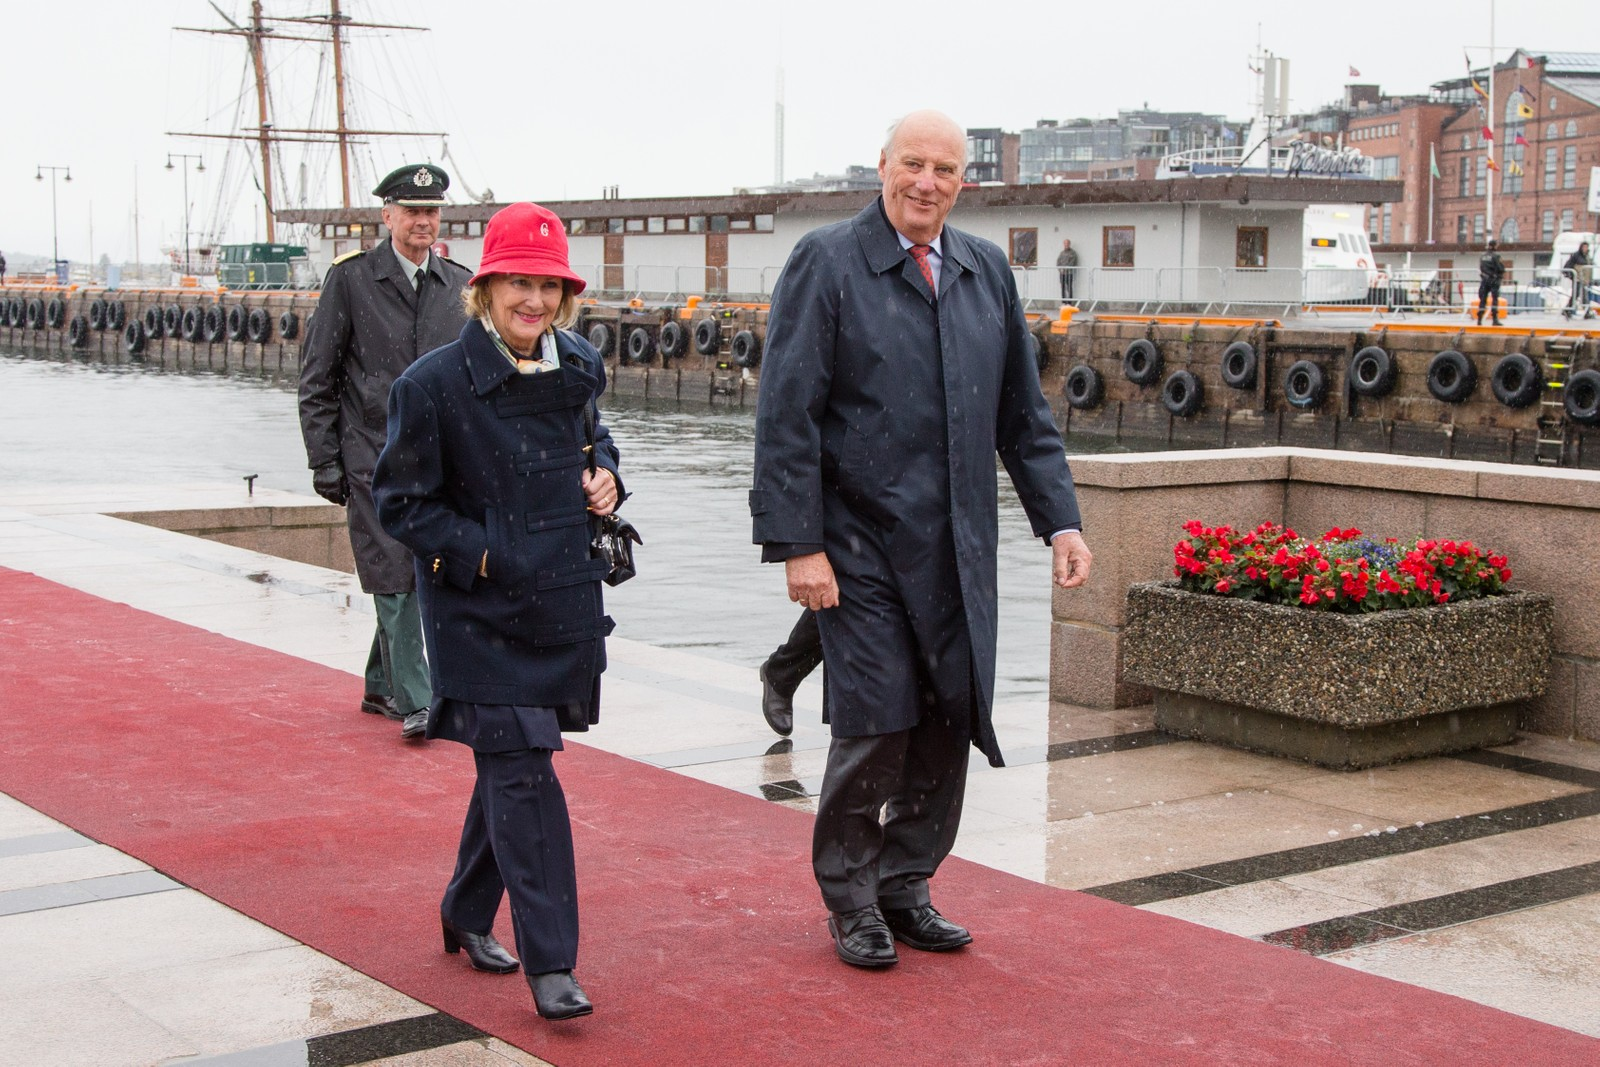 Dronning Sonja og kong Harald ved ankomst på Honnørbrygga i Oslo etter lunsj på Kongeskipet Norge onsdag.